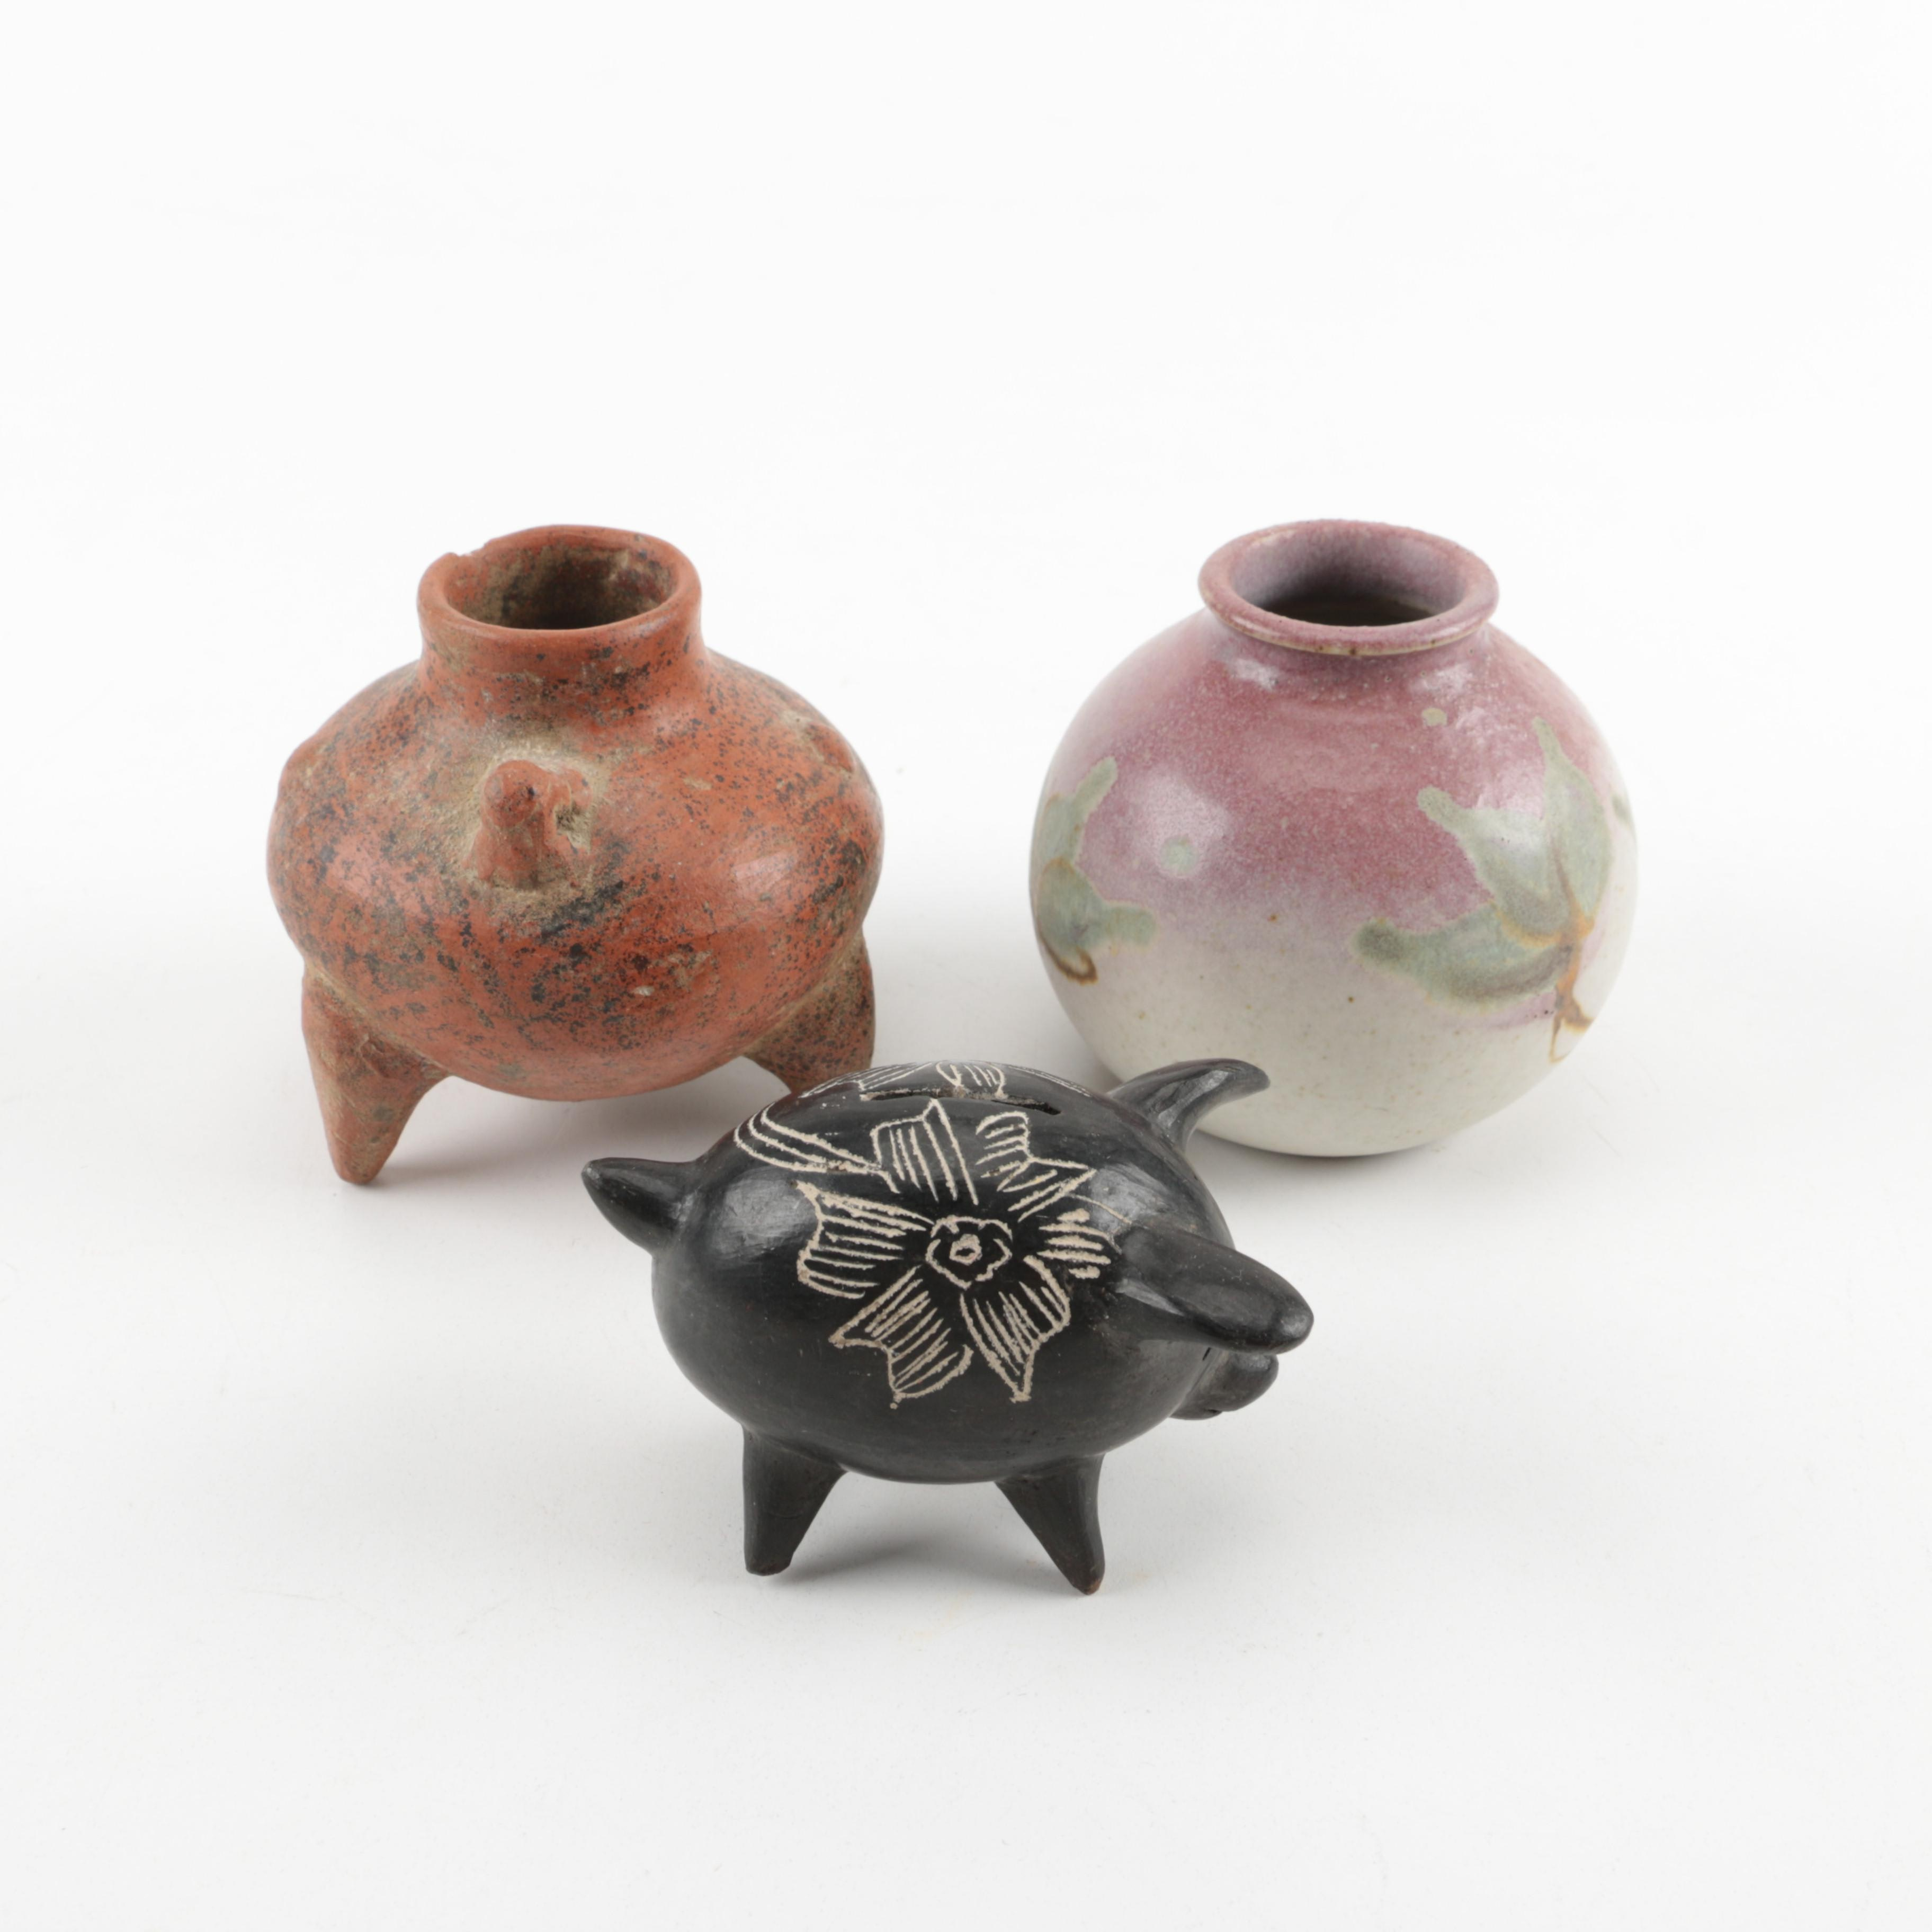 Assortment of Ceramic Vases and Piggy Bank